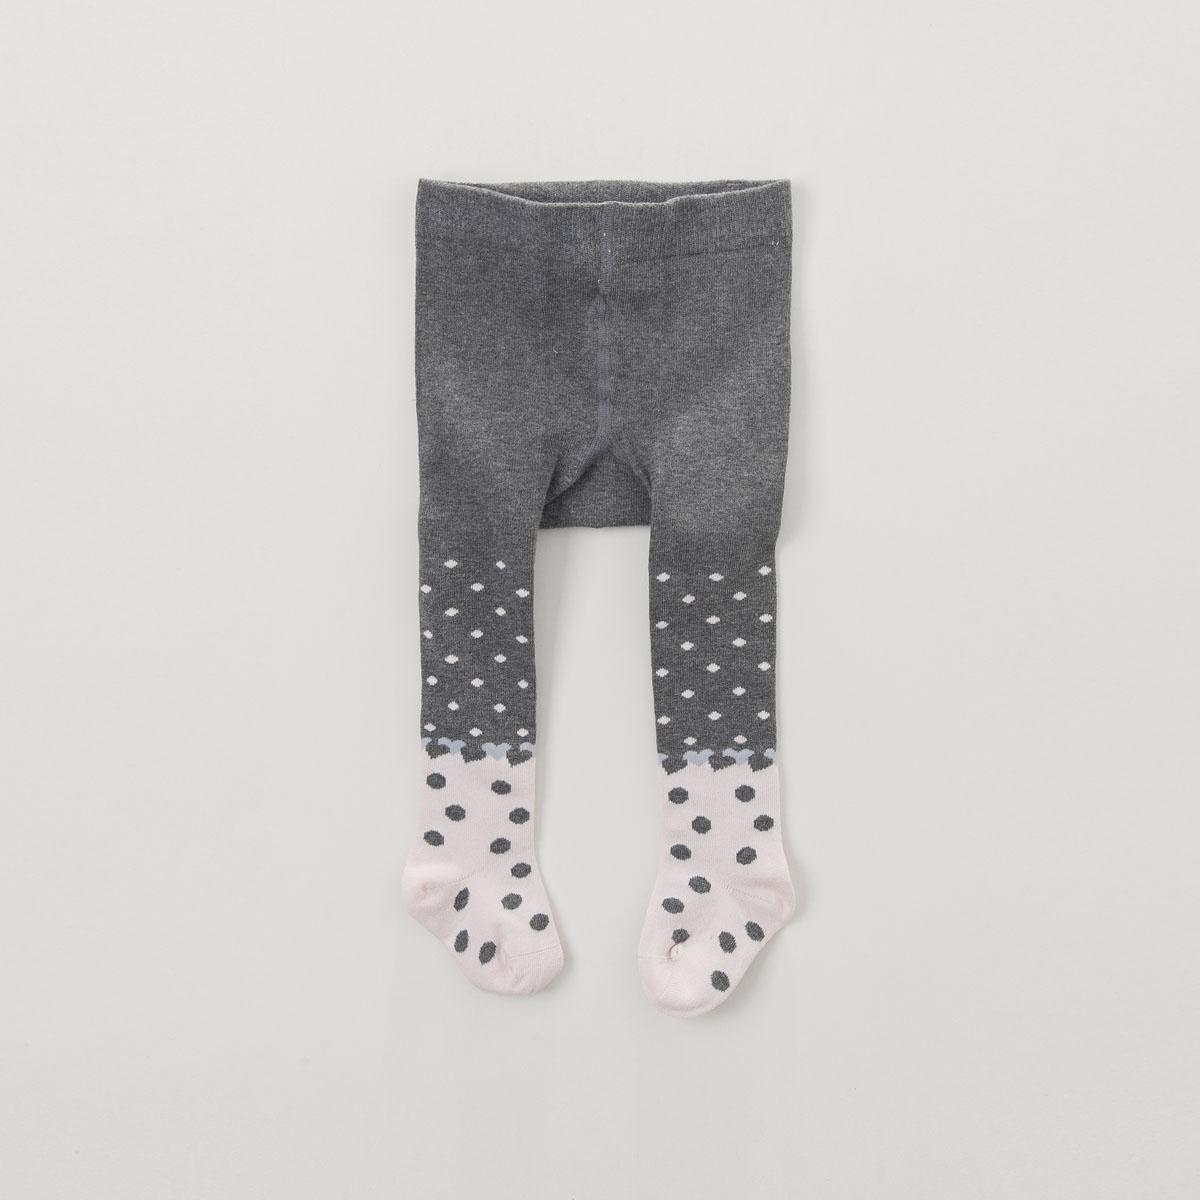 davebella戴維貝拉 2016女童秋裝打底褲 女寶寶 褲襪 連褲襪DK